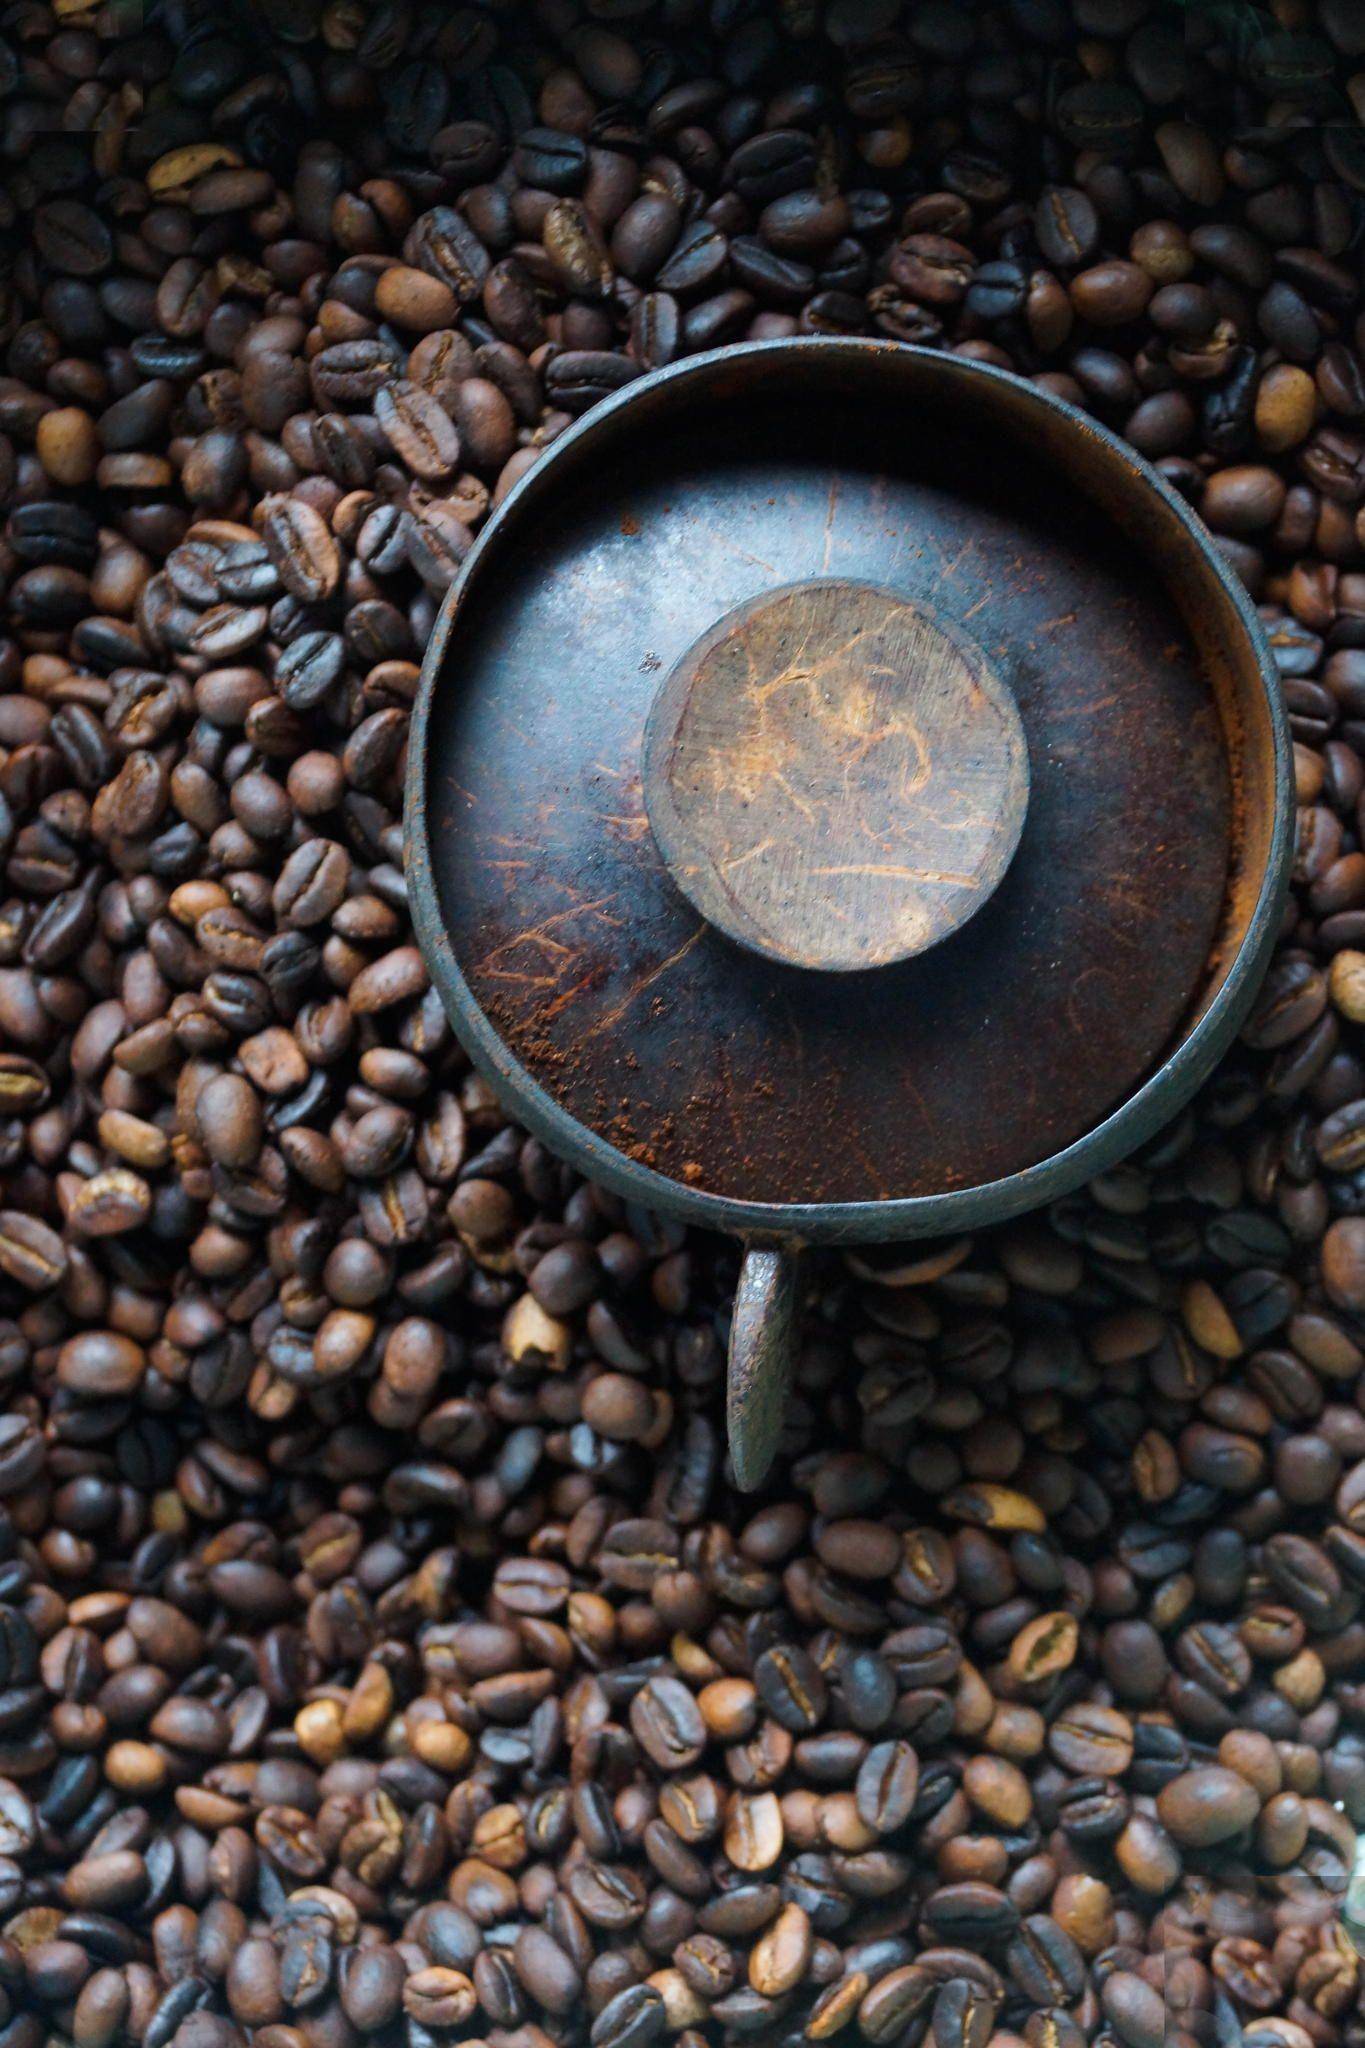 Kopi Luwak, the finest coffee bean, Ubud, Tegalalang, Bali